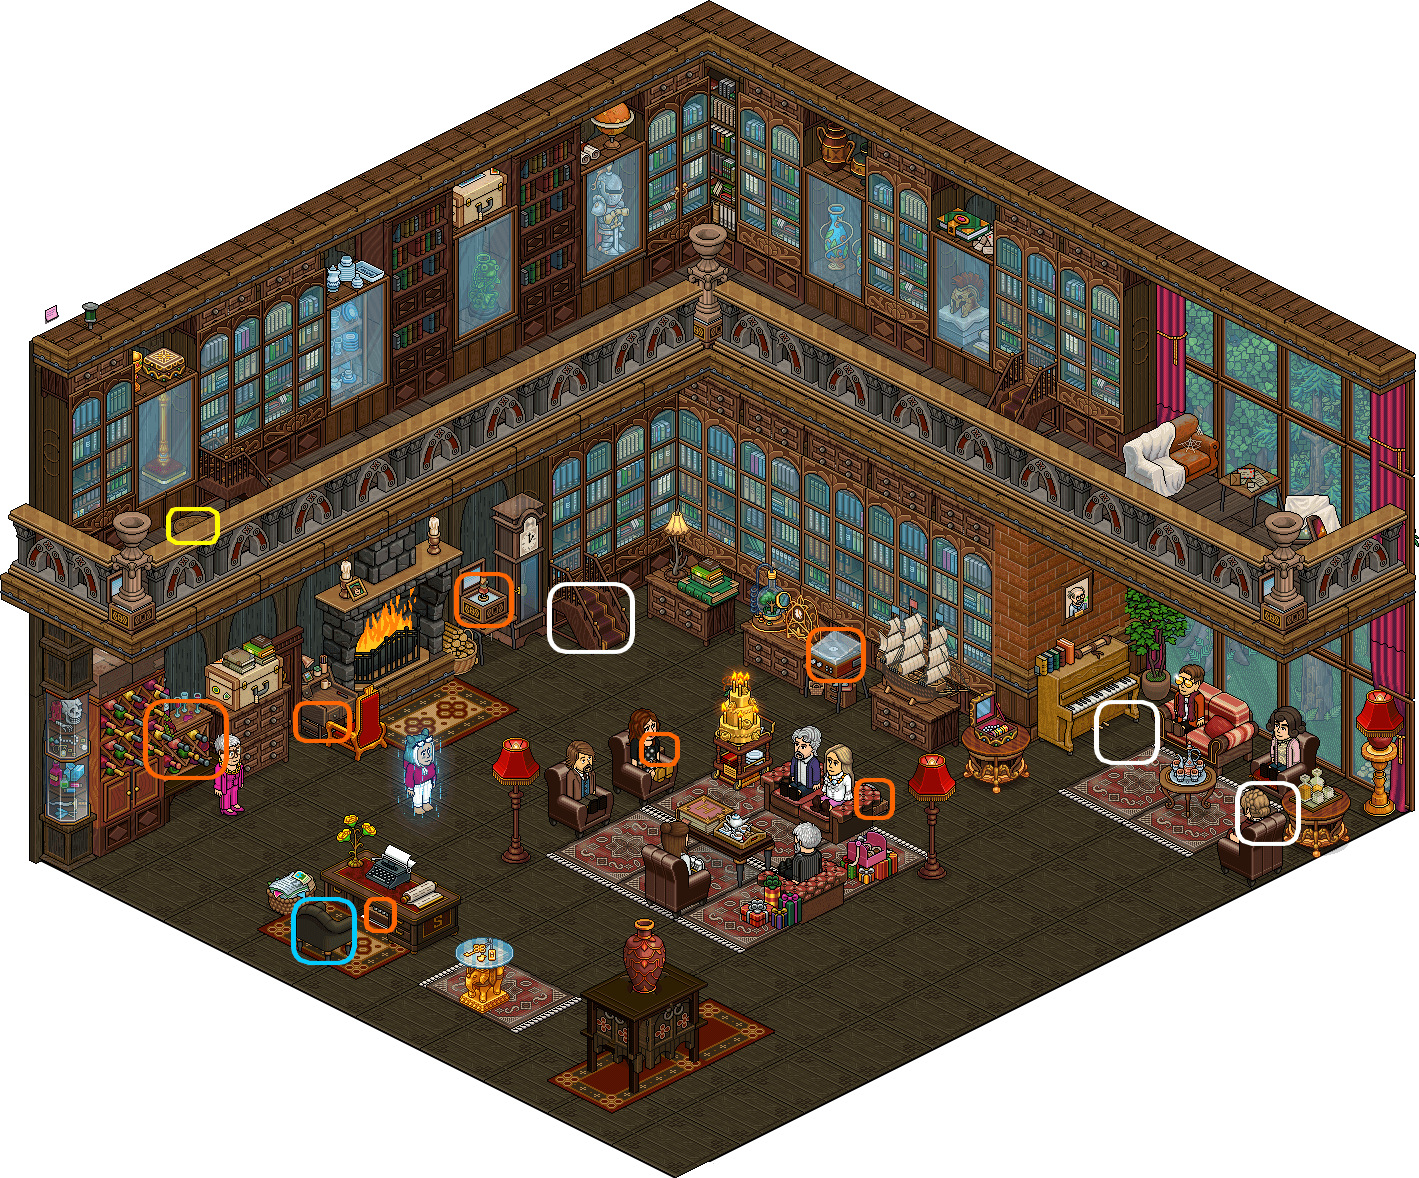 [K.O] Introduction2 - Salon principal - soirée